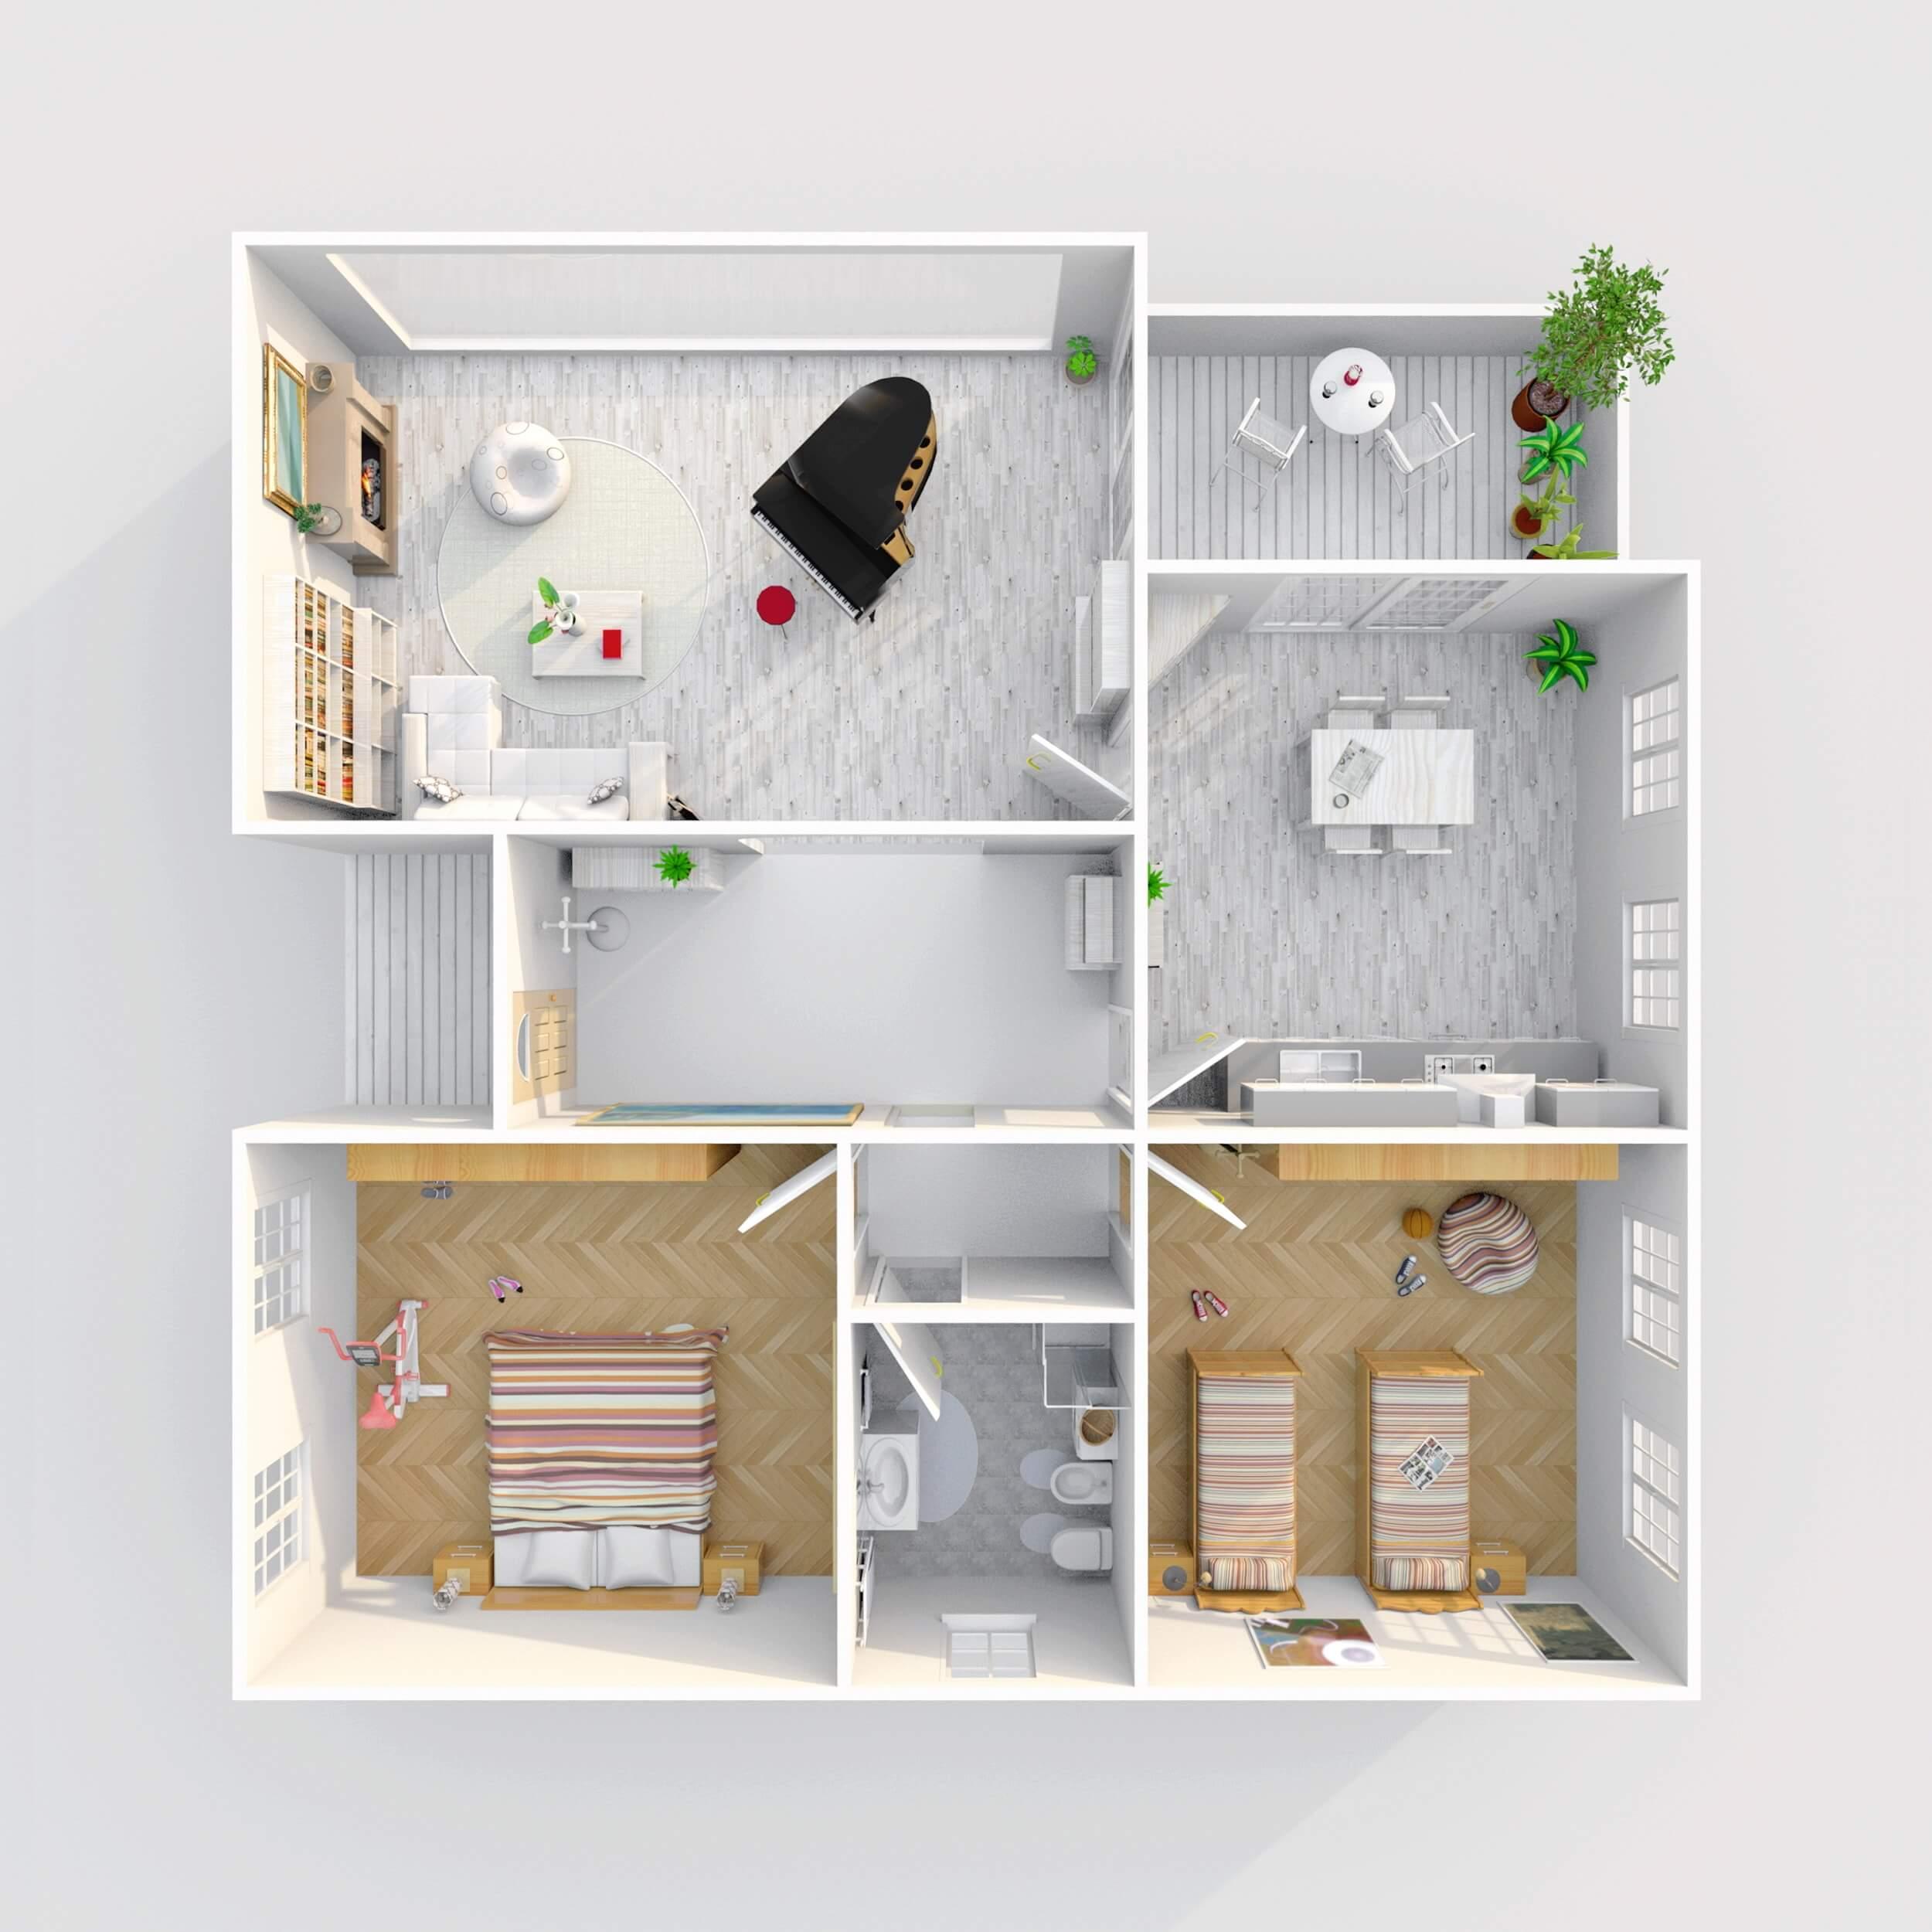 Home Interior Design Services Fort Lauderdale, FL